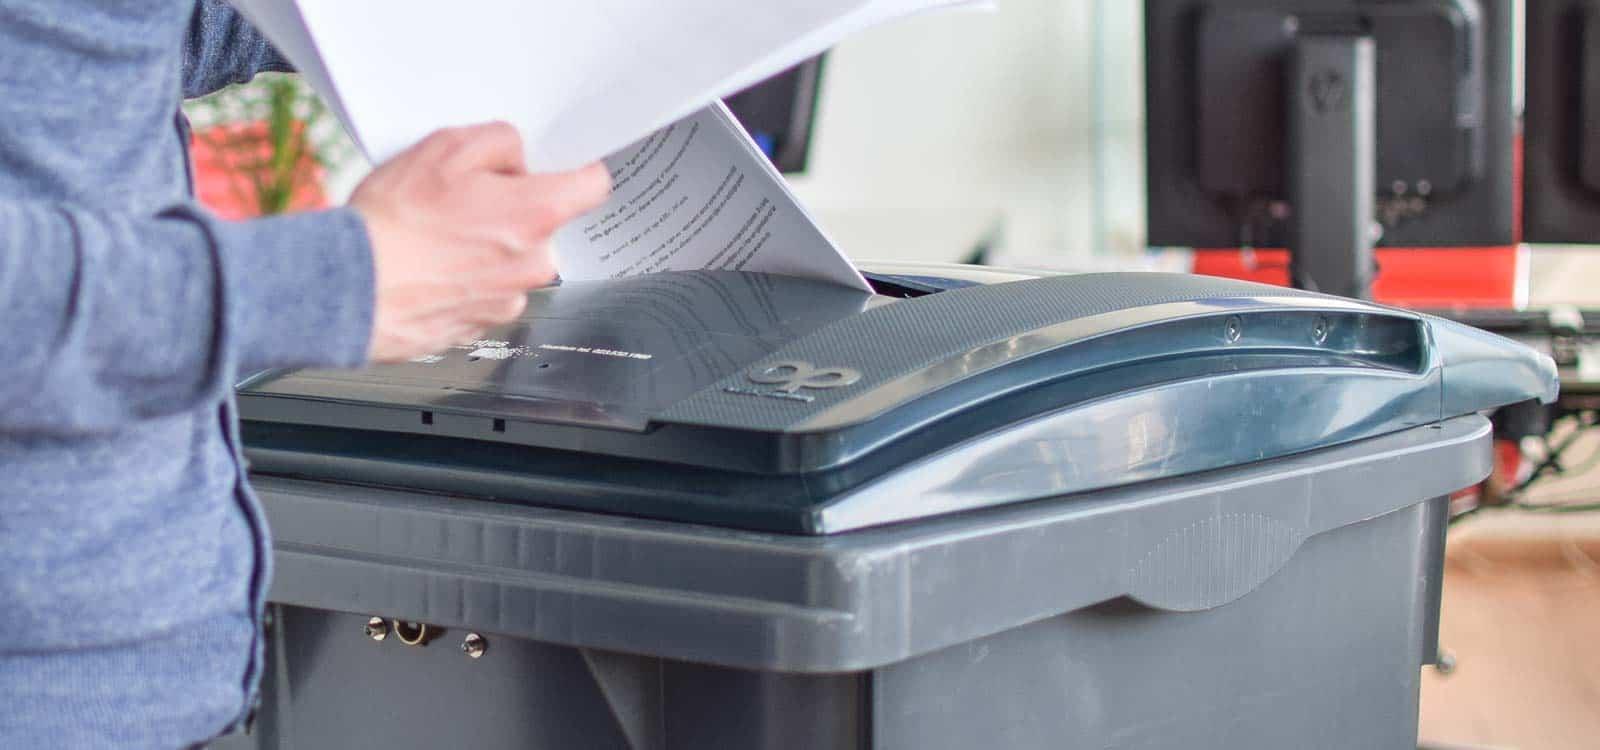 shred-bins-lockable-security